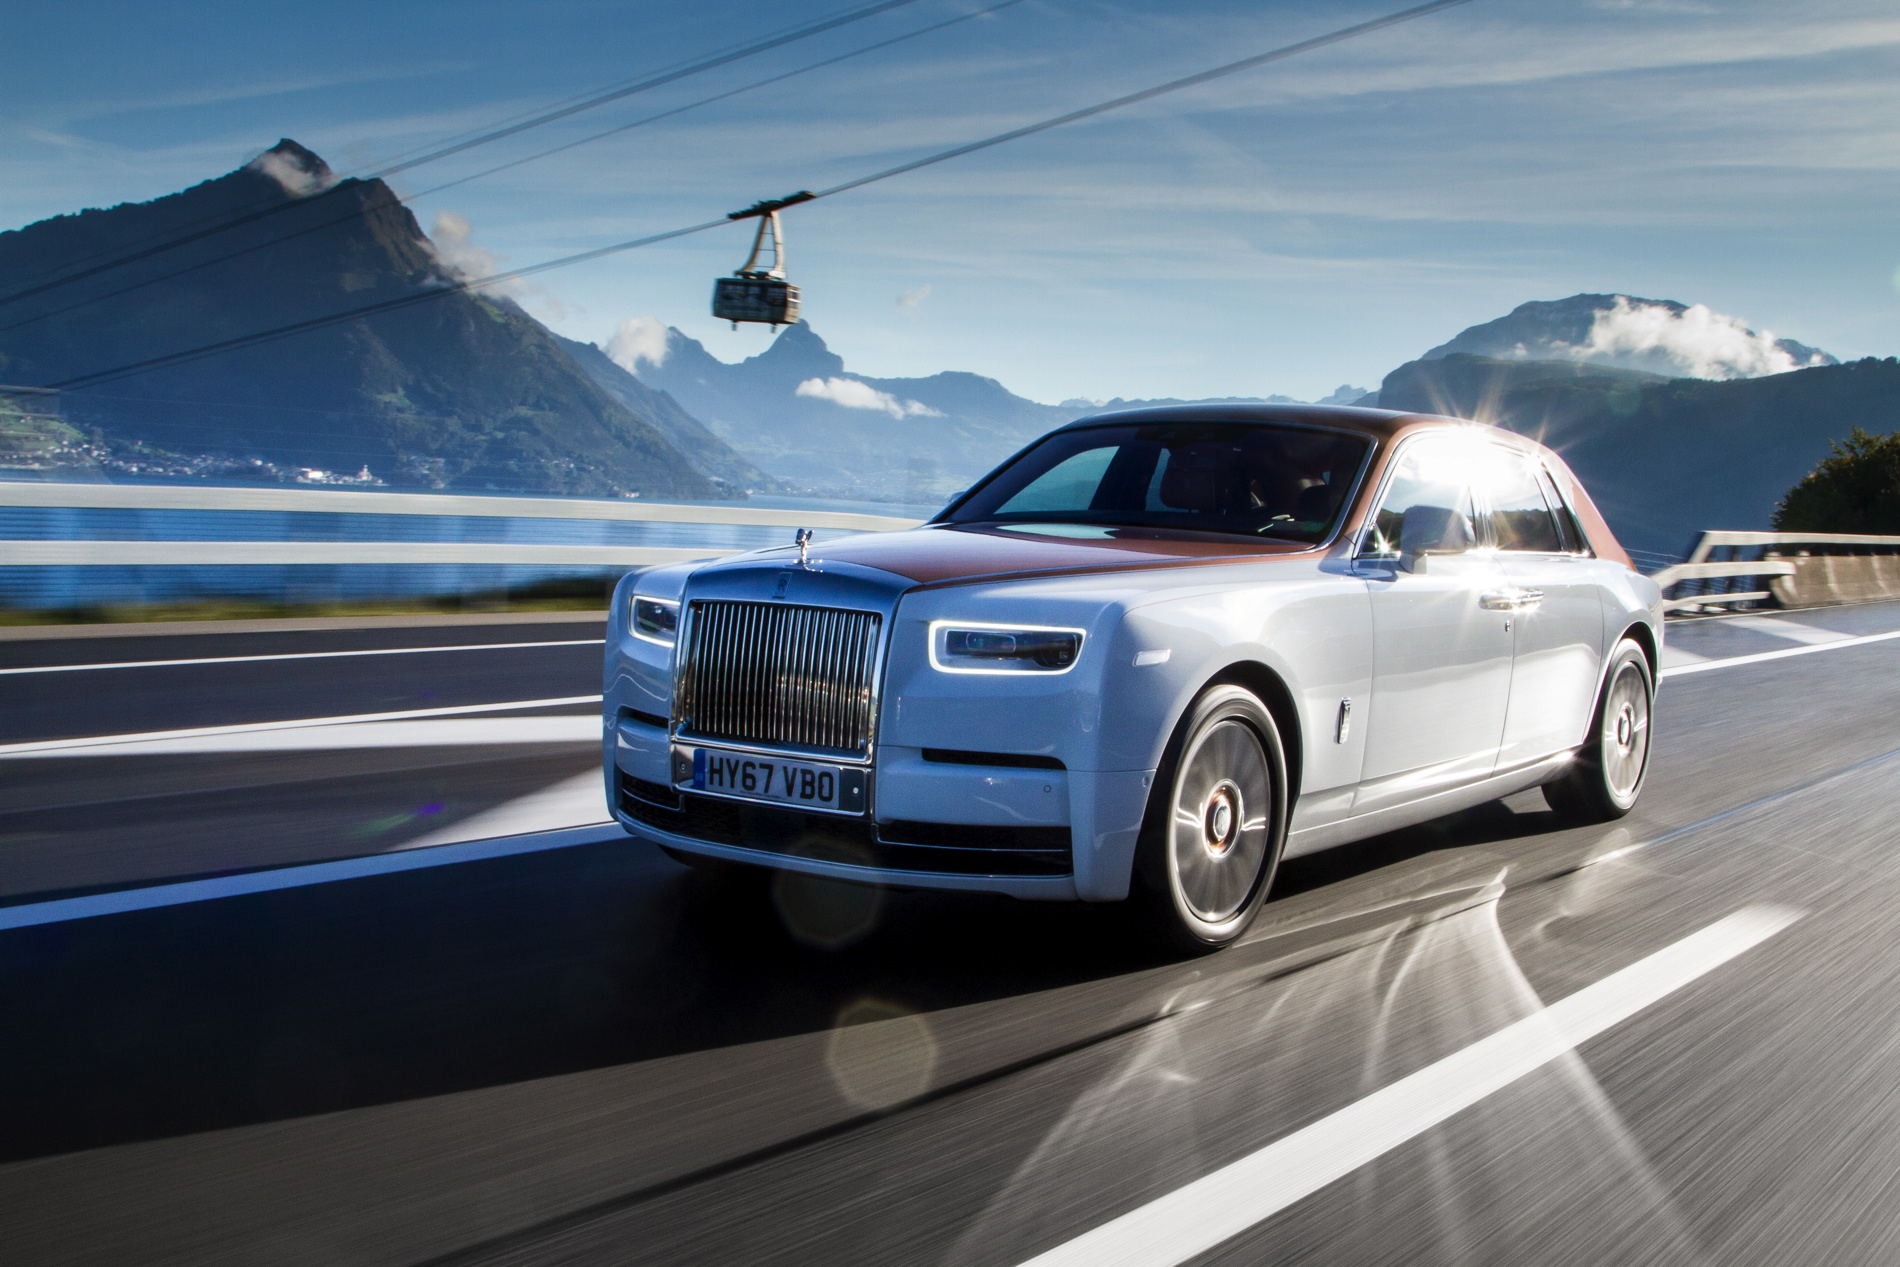 Rolls Royce Phantom VIII 86